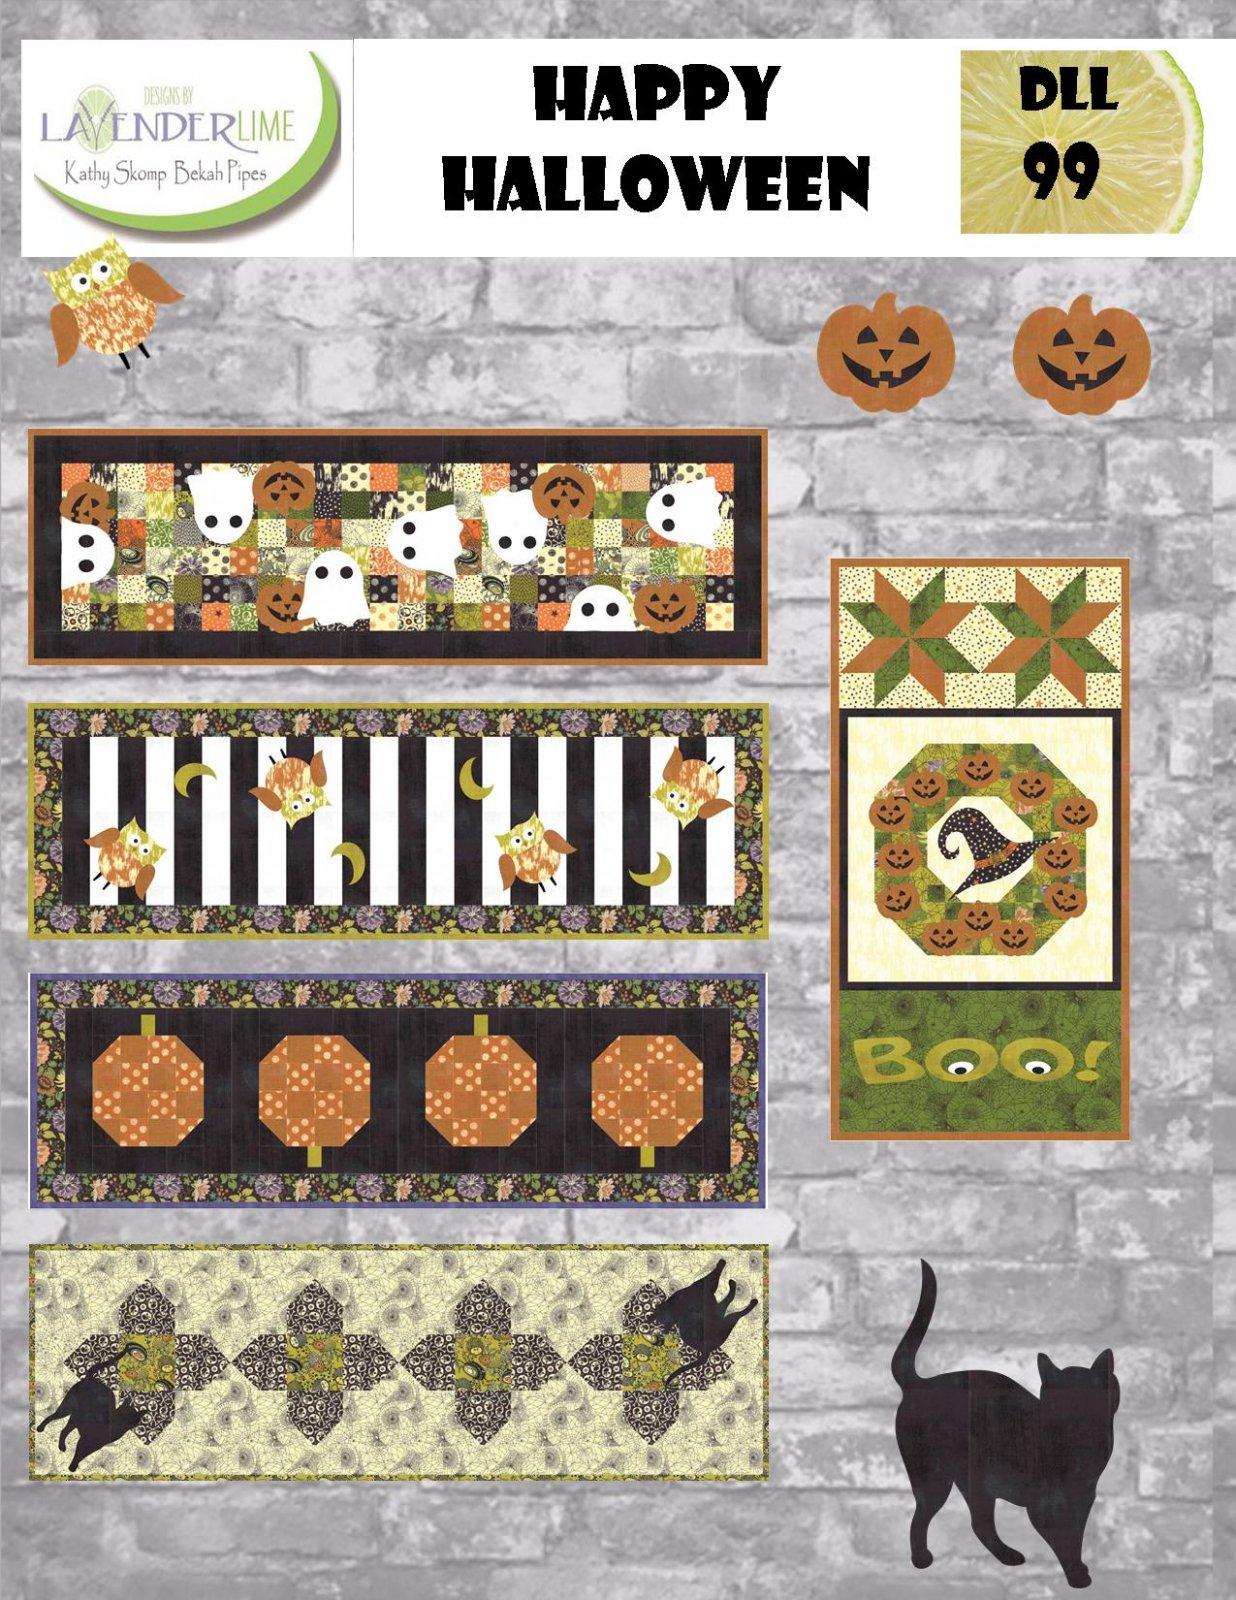 Happy Halloween PDF Download